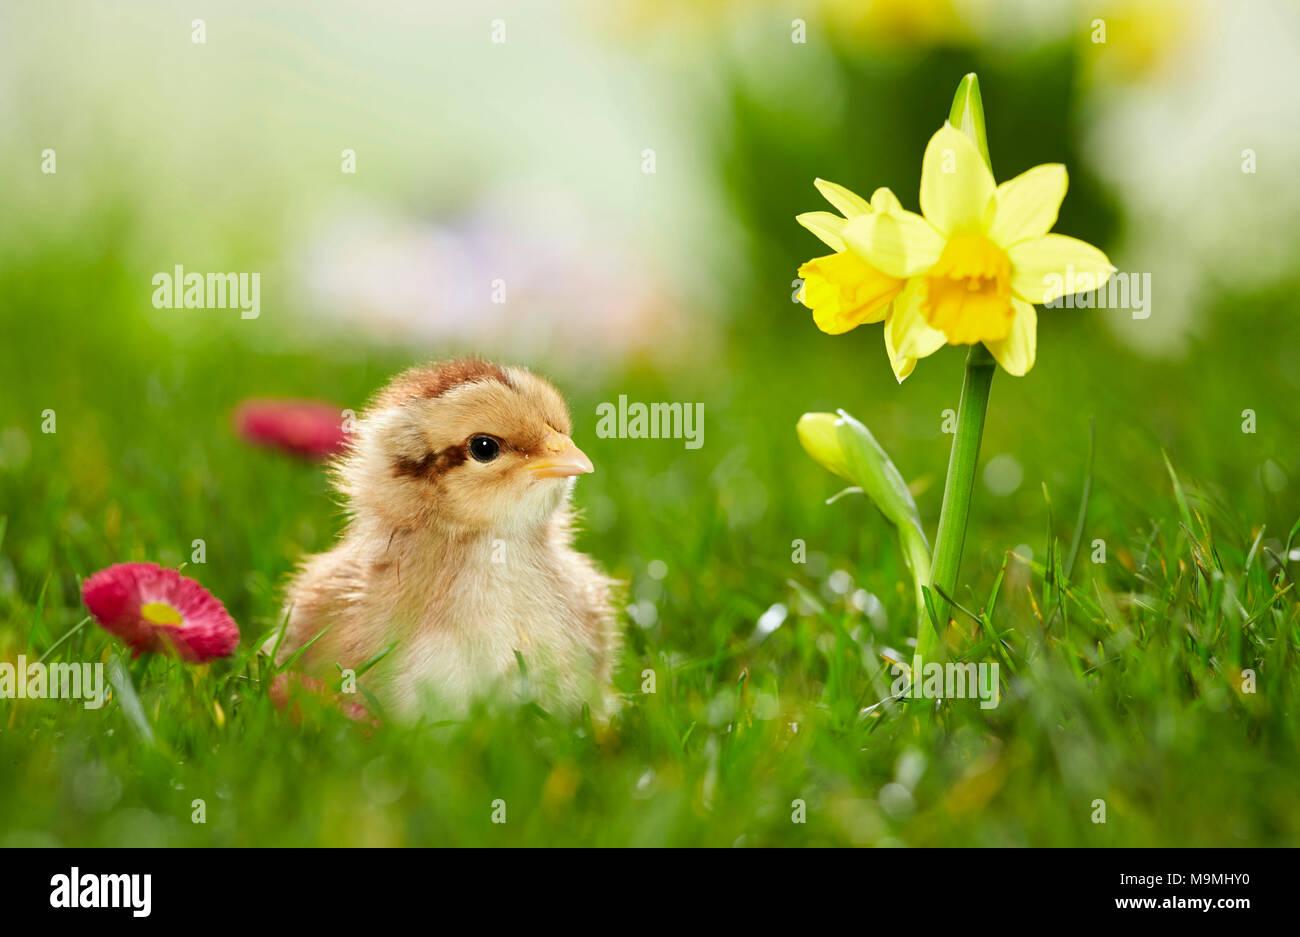 Welsummer Chicken. Chicken in flowering meadow in spring. Germany - Stock Image